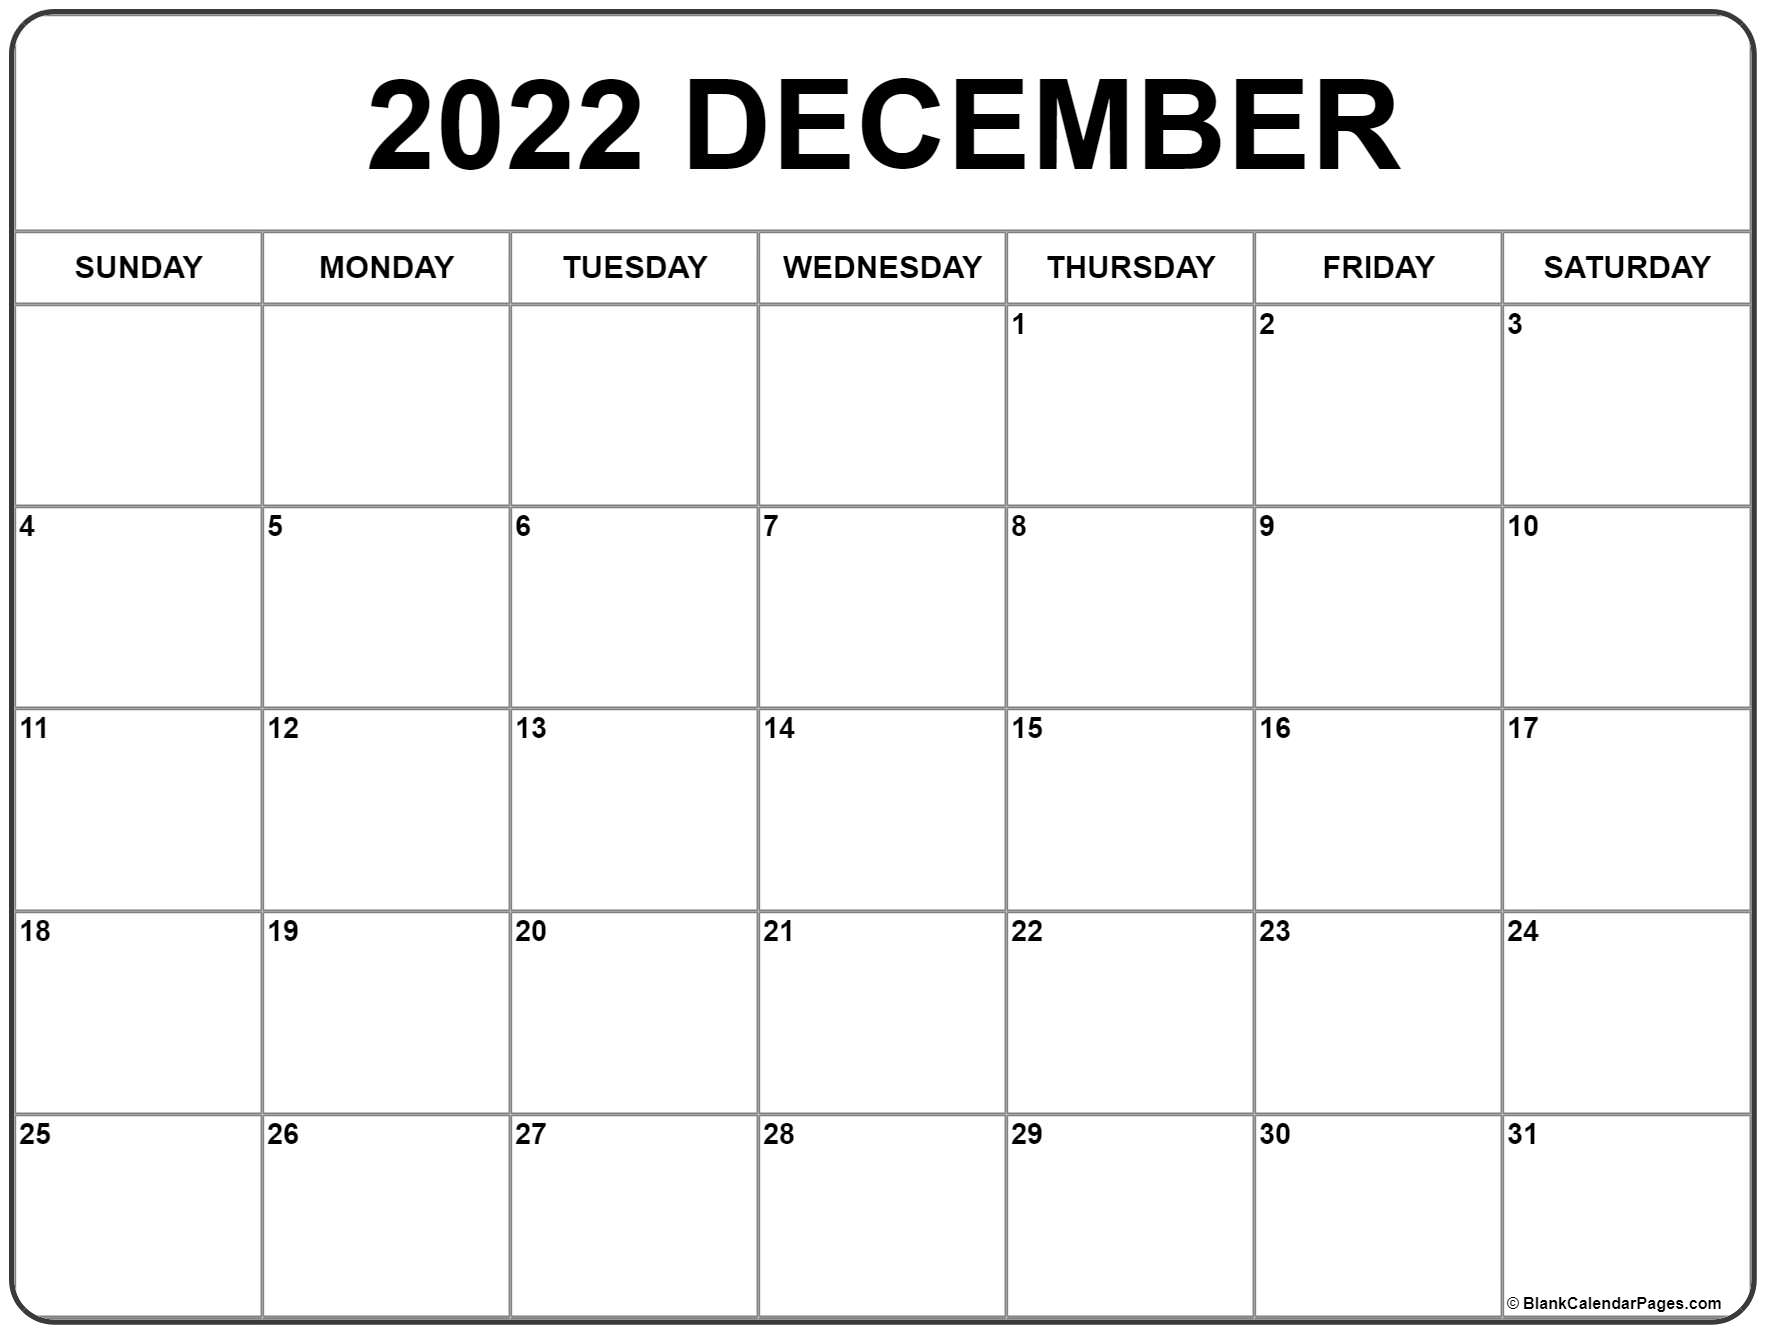 December 2018 calendar . December 2018 calendar printableDecember 2018 printable calendar. December calendar 2018